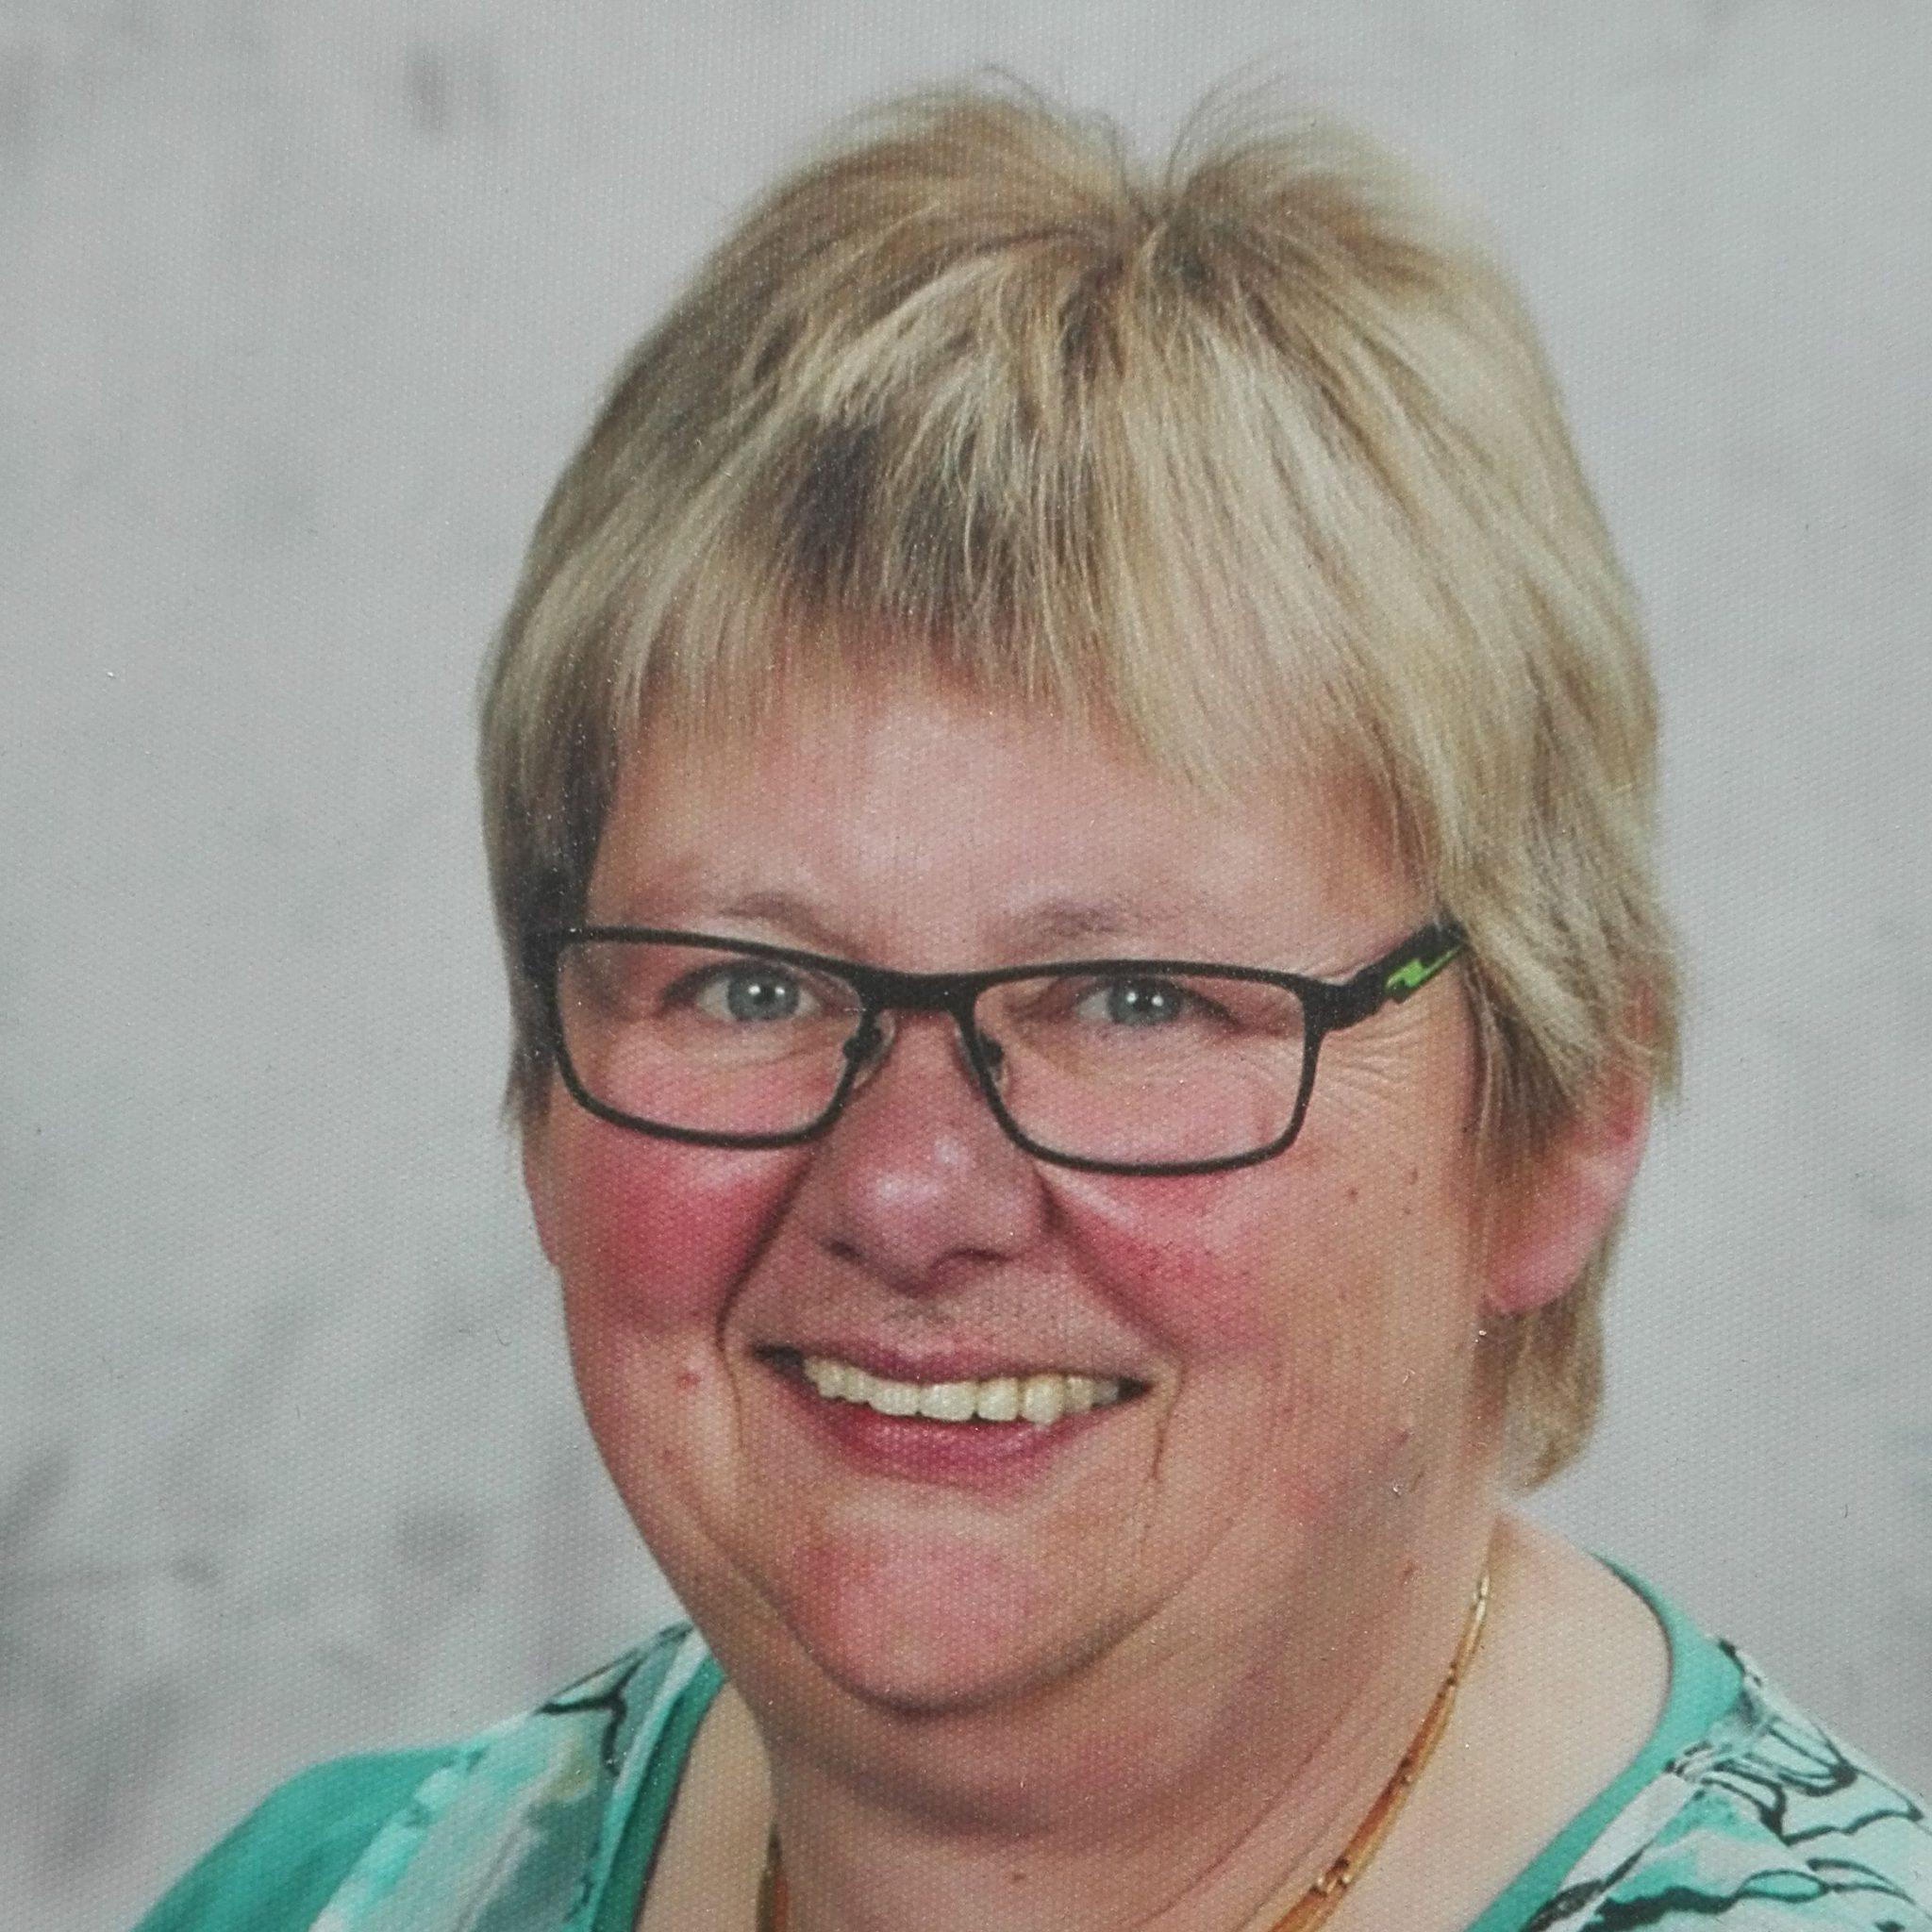 Frau Birgit Rövekamp - Bruns